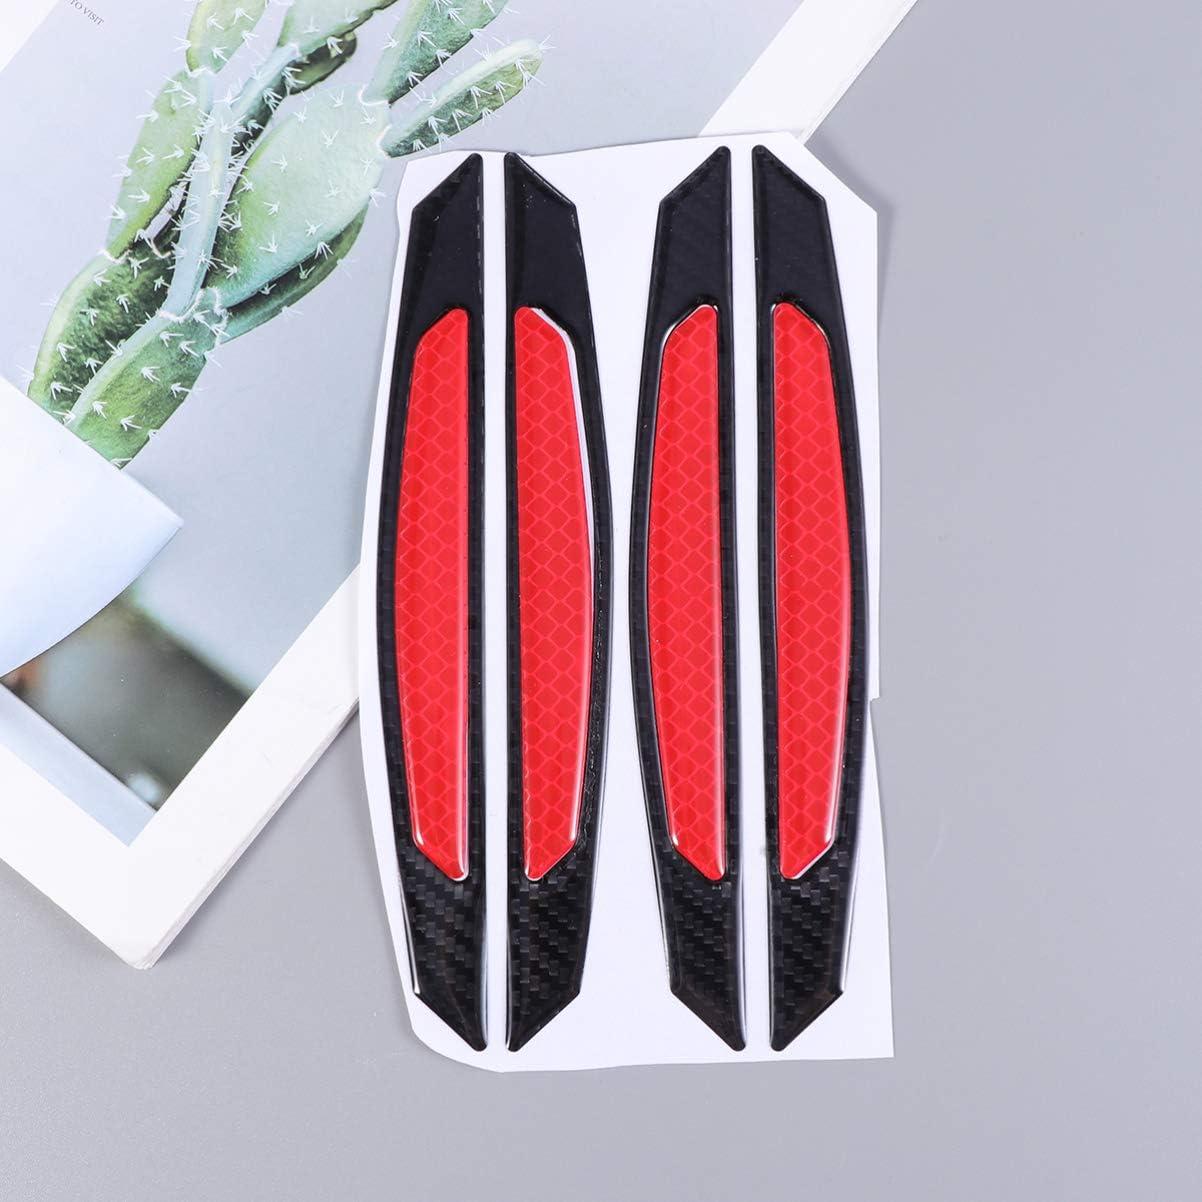 Vosarea Car Door Entry Guard Protectors,4pcs Car Door Edge Anti Collision Bumper Sticker Reflective Carbon Fiber Door Anti-Rub Strips Anti-Scratch Protection Guards Trim Stickers